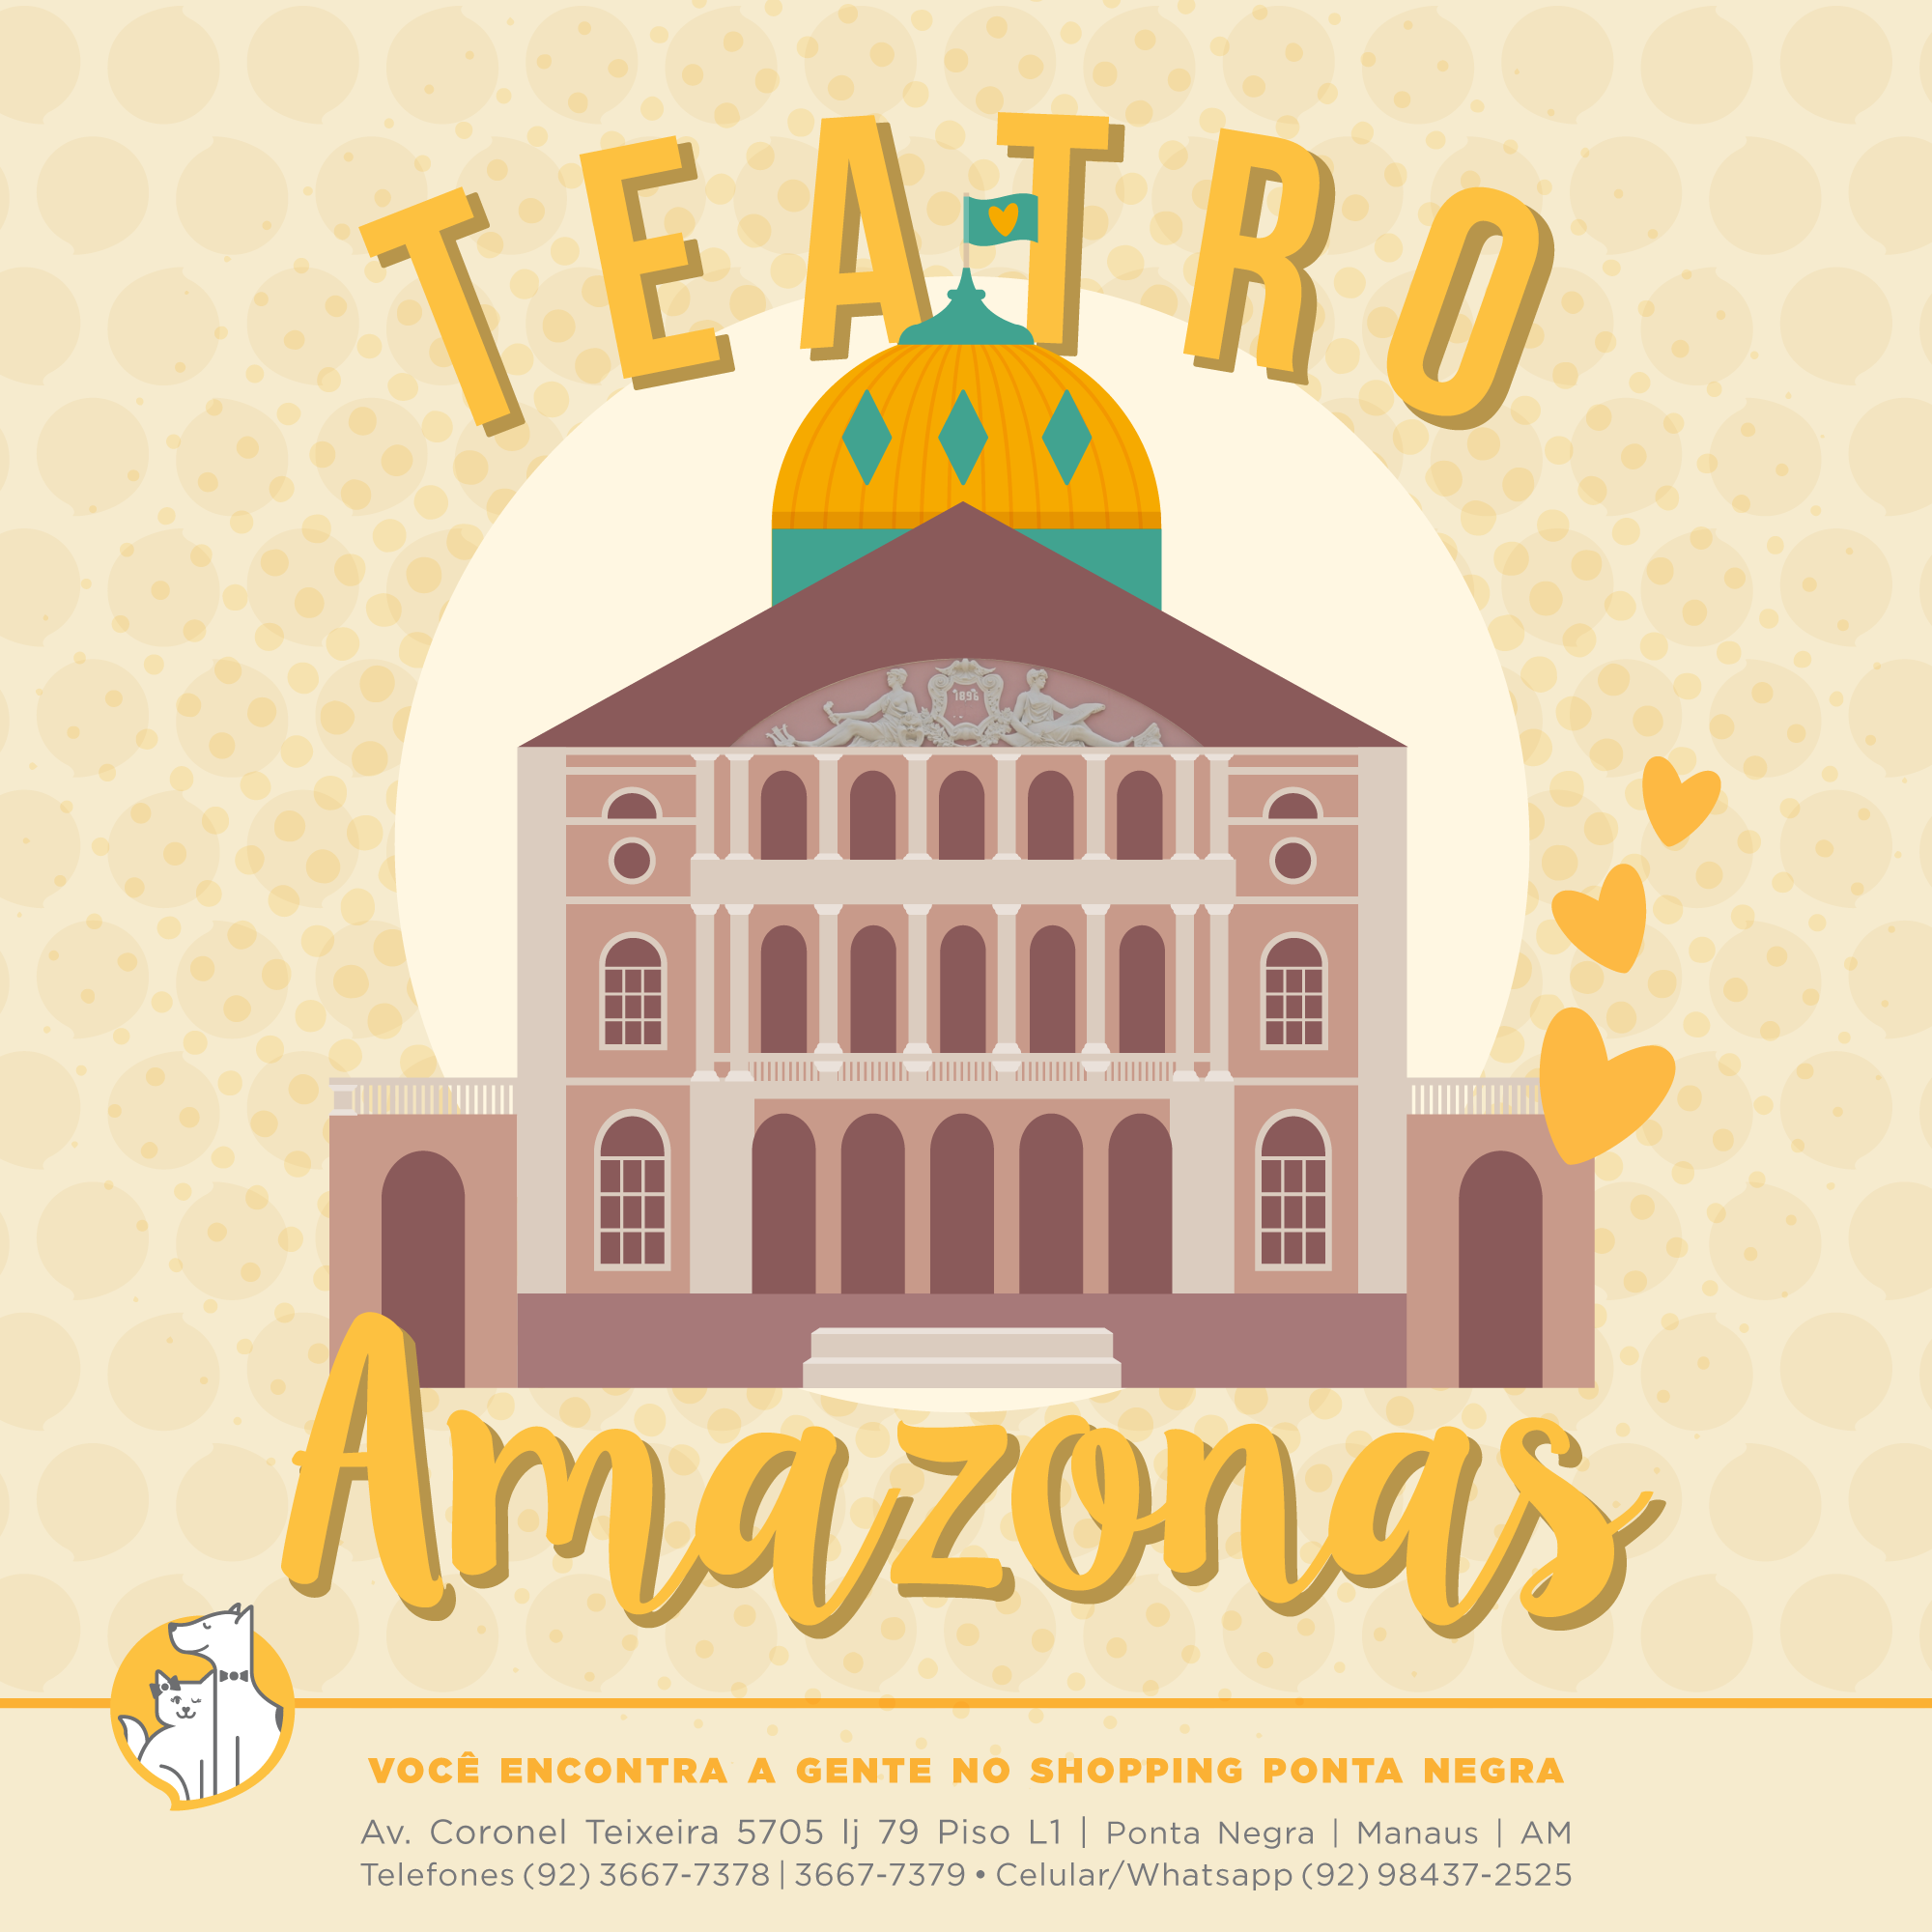 037-TeatroAmazonas.png